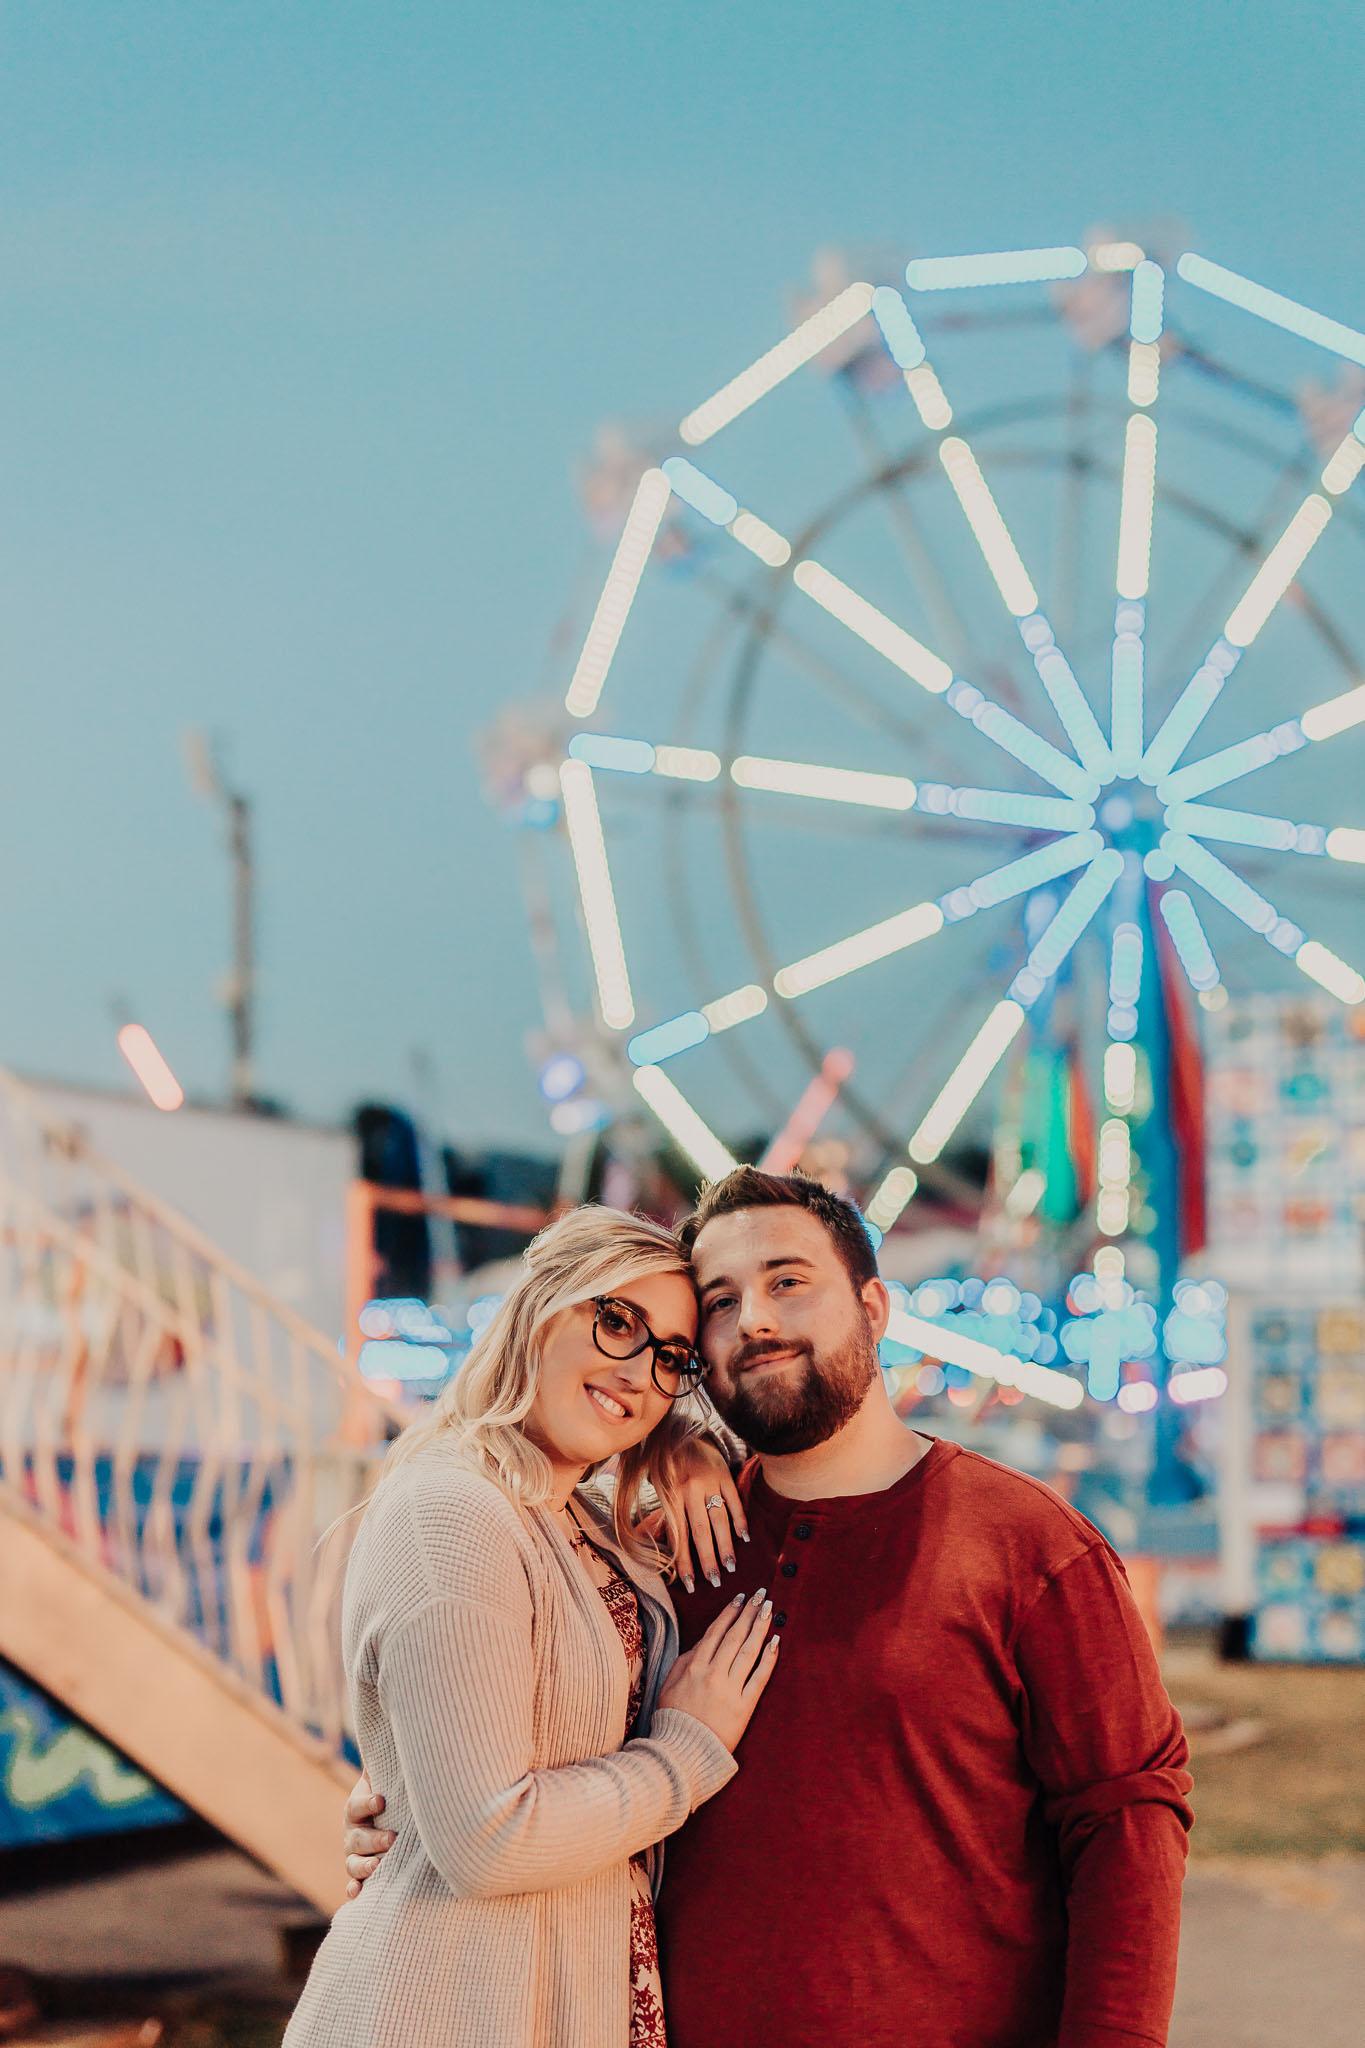 bloomsburg-fair-engagement-5529.jpg